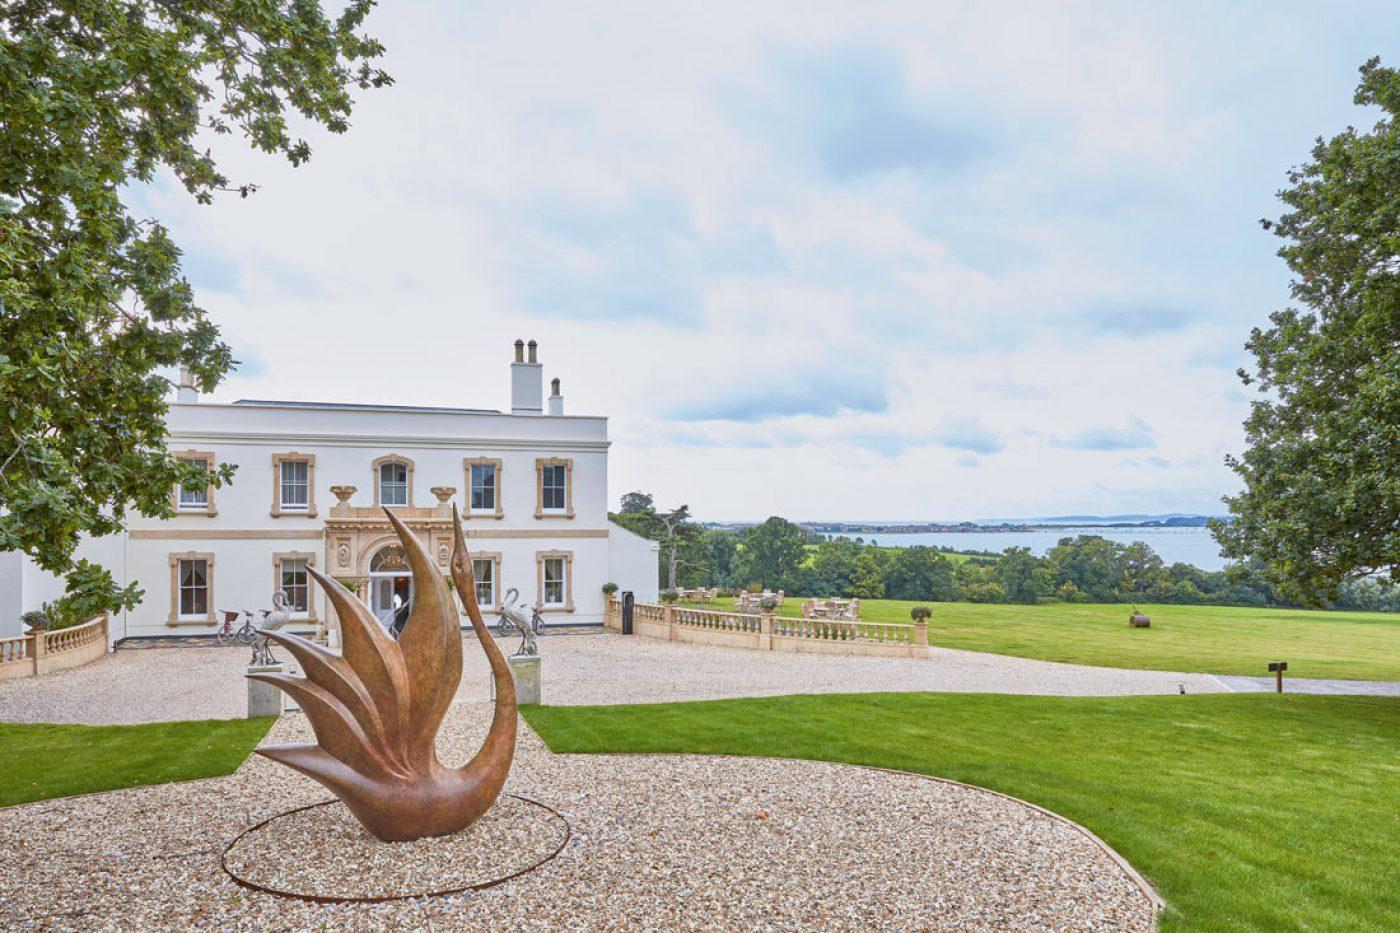 Lympstone Manor - Gourmet Getaway